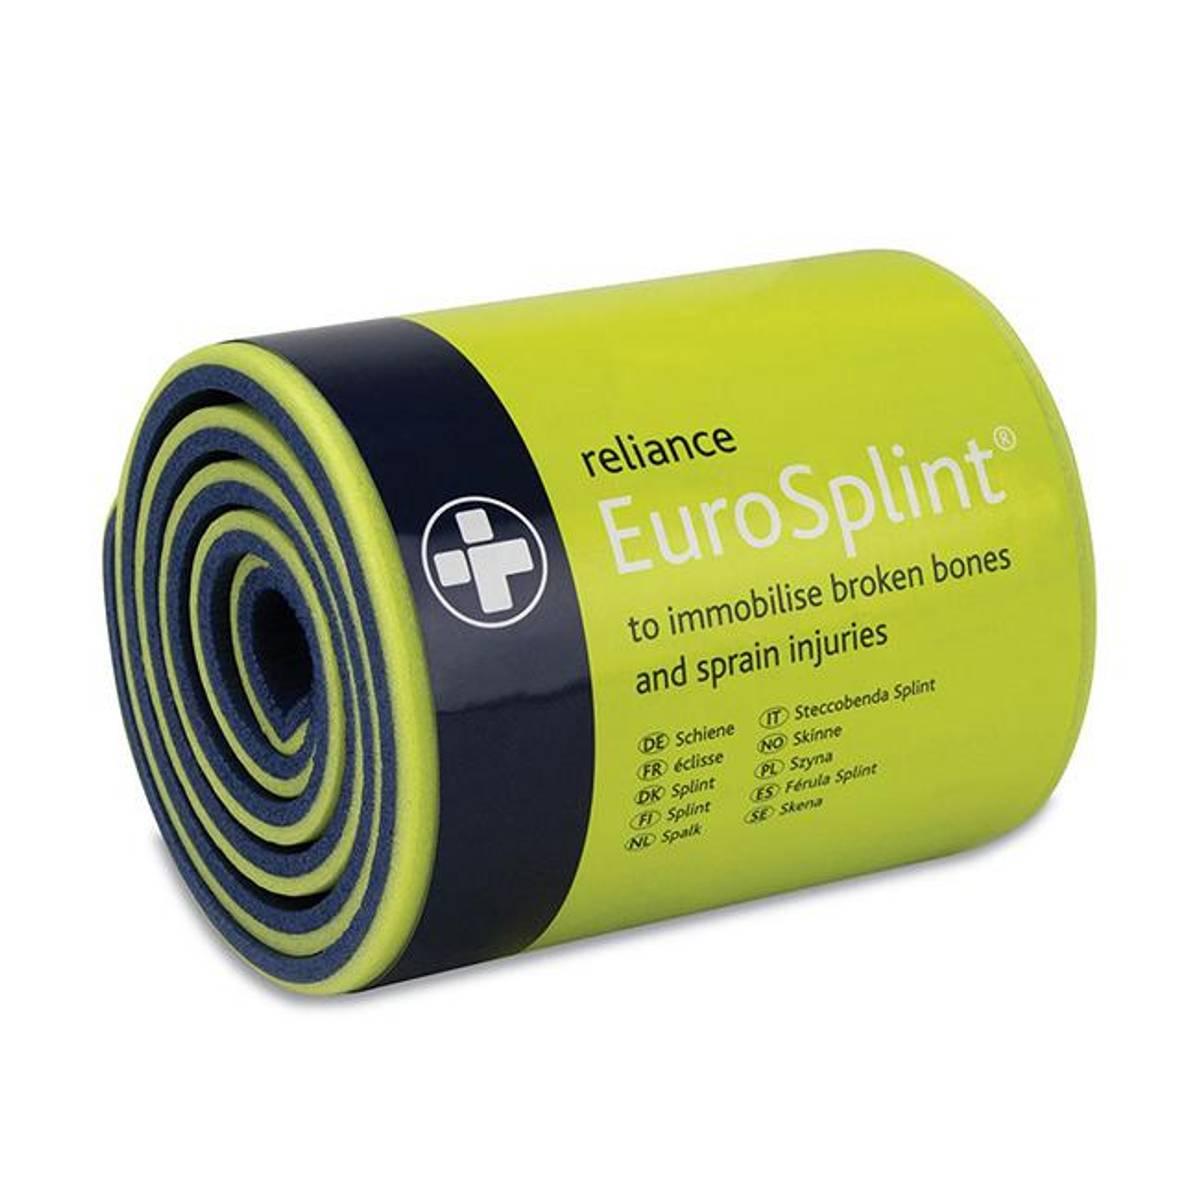 Eurosplint 11cm x 90cm